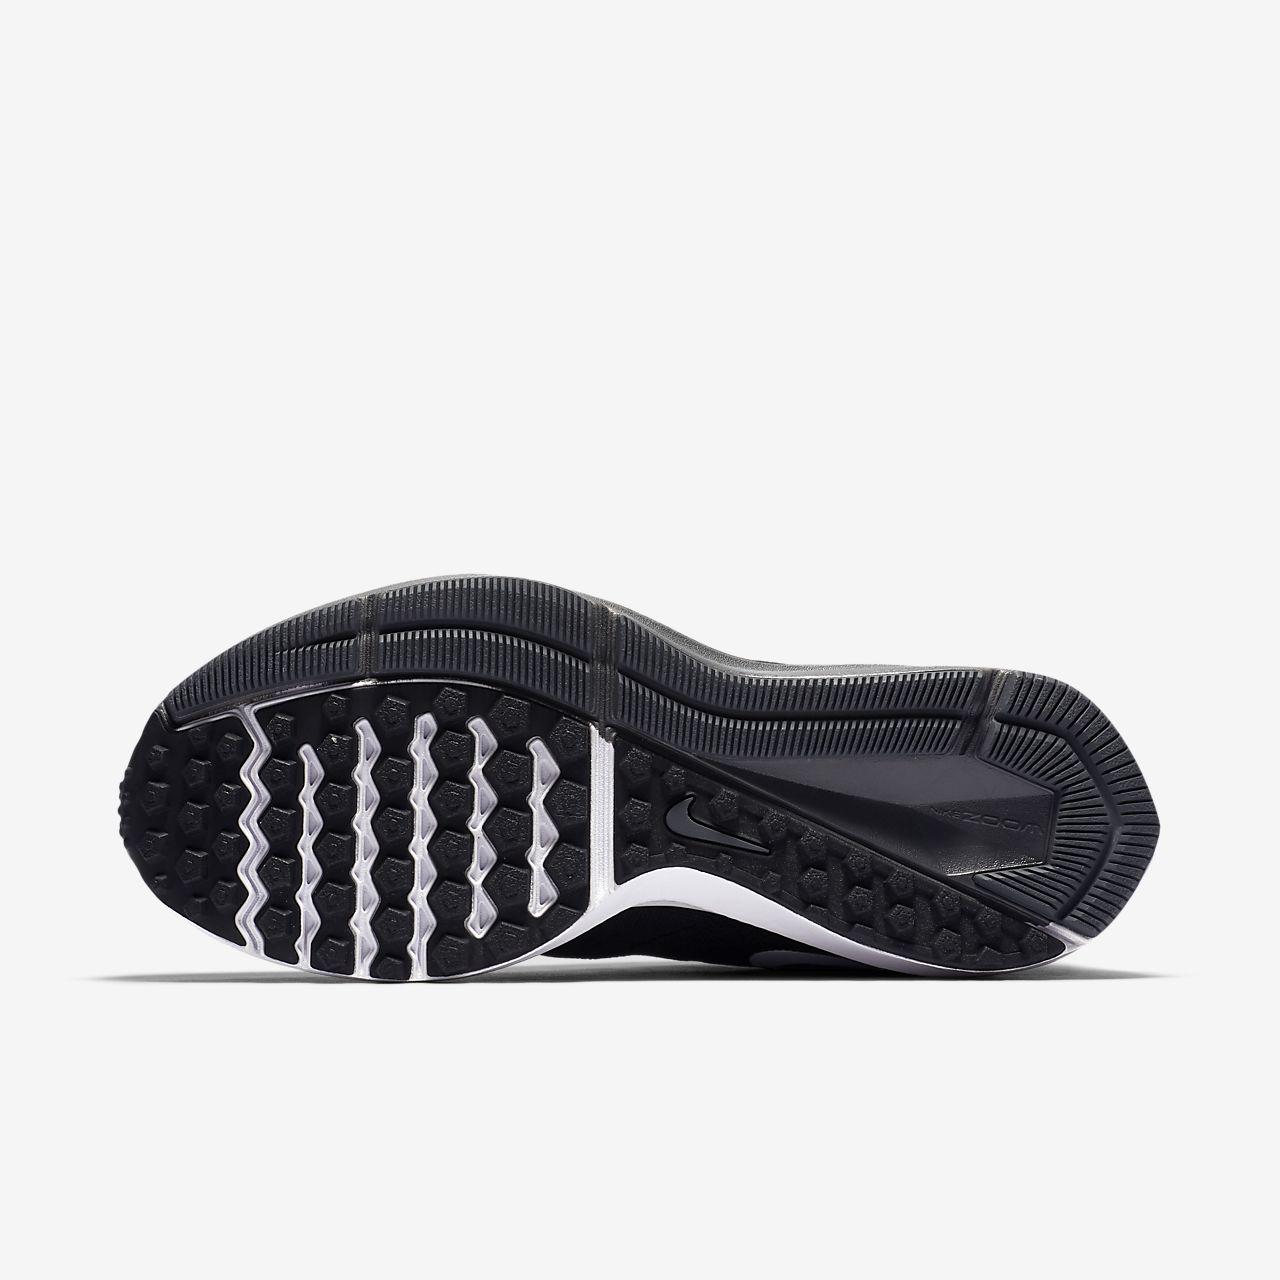 Winflo FemmeCh De Running Chaussure 4 Pour Nike Zoom HED29IW